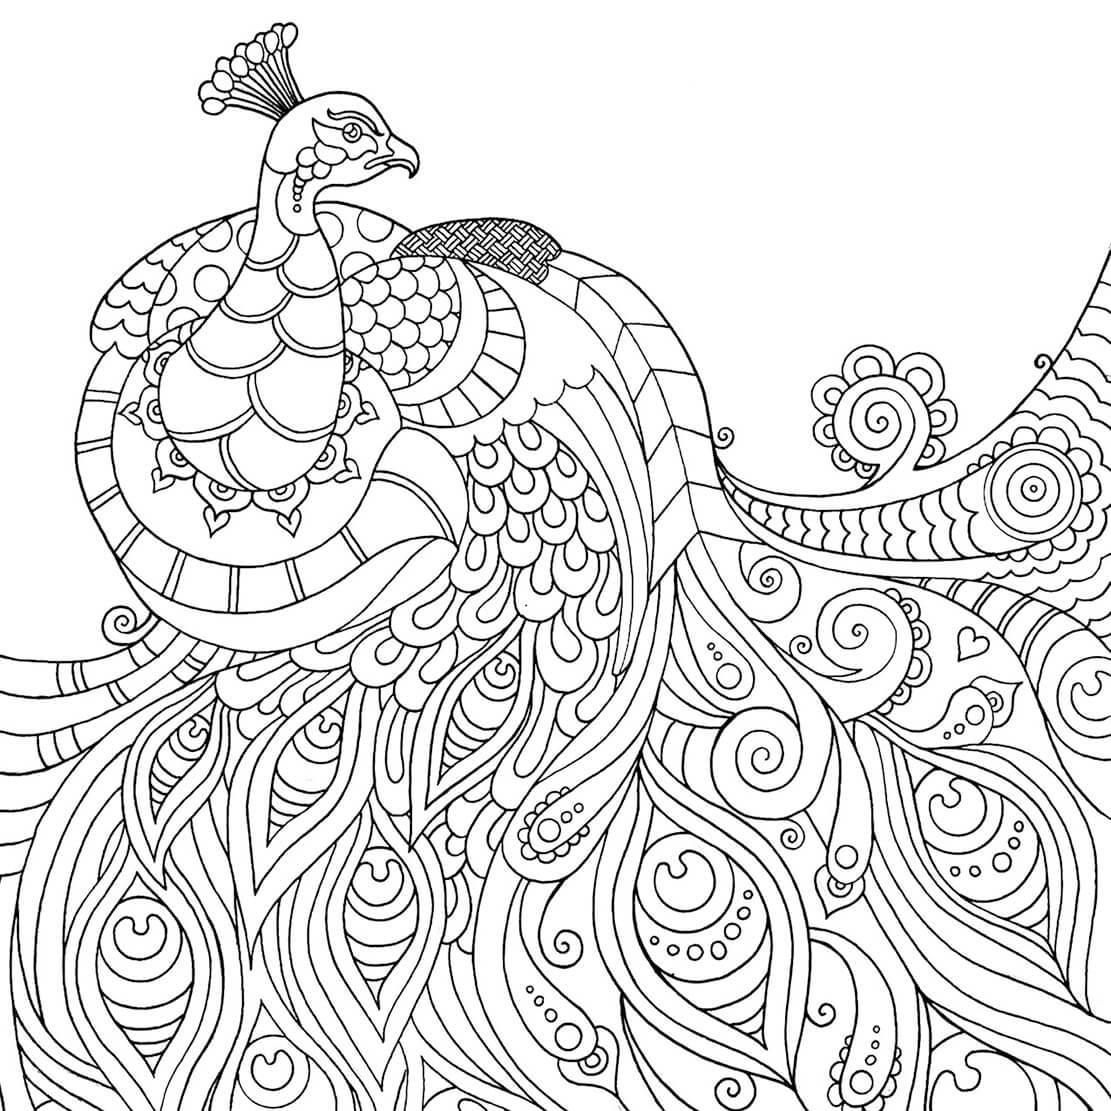 Peacock Mindfulness